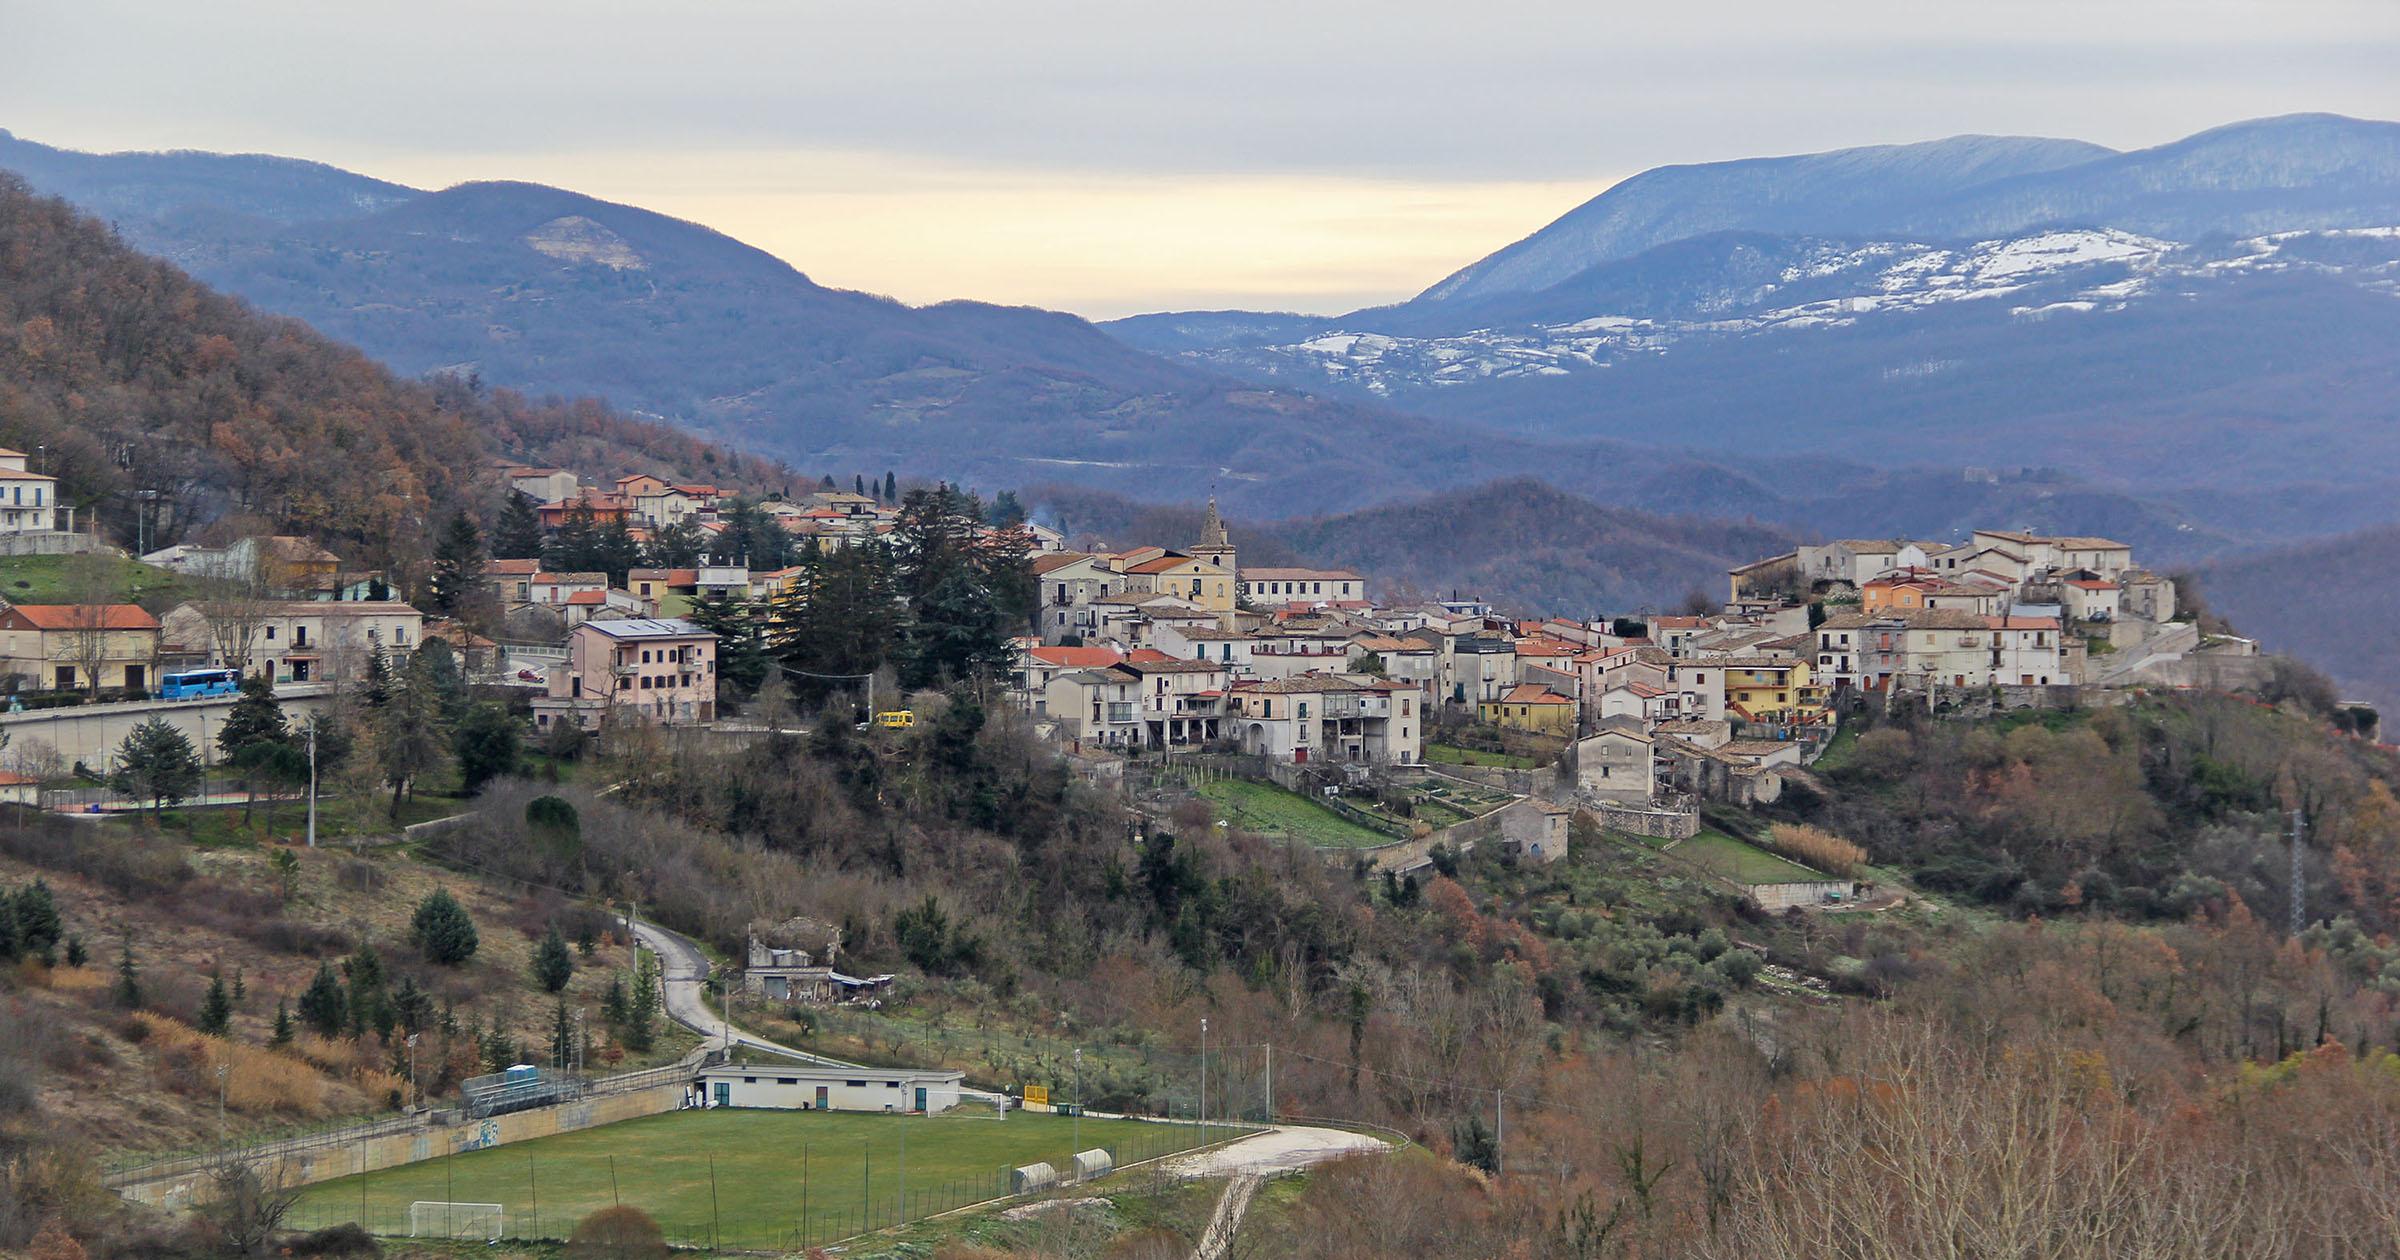 Forlì del Sannio